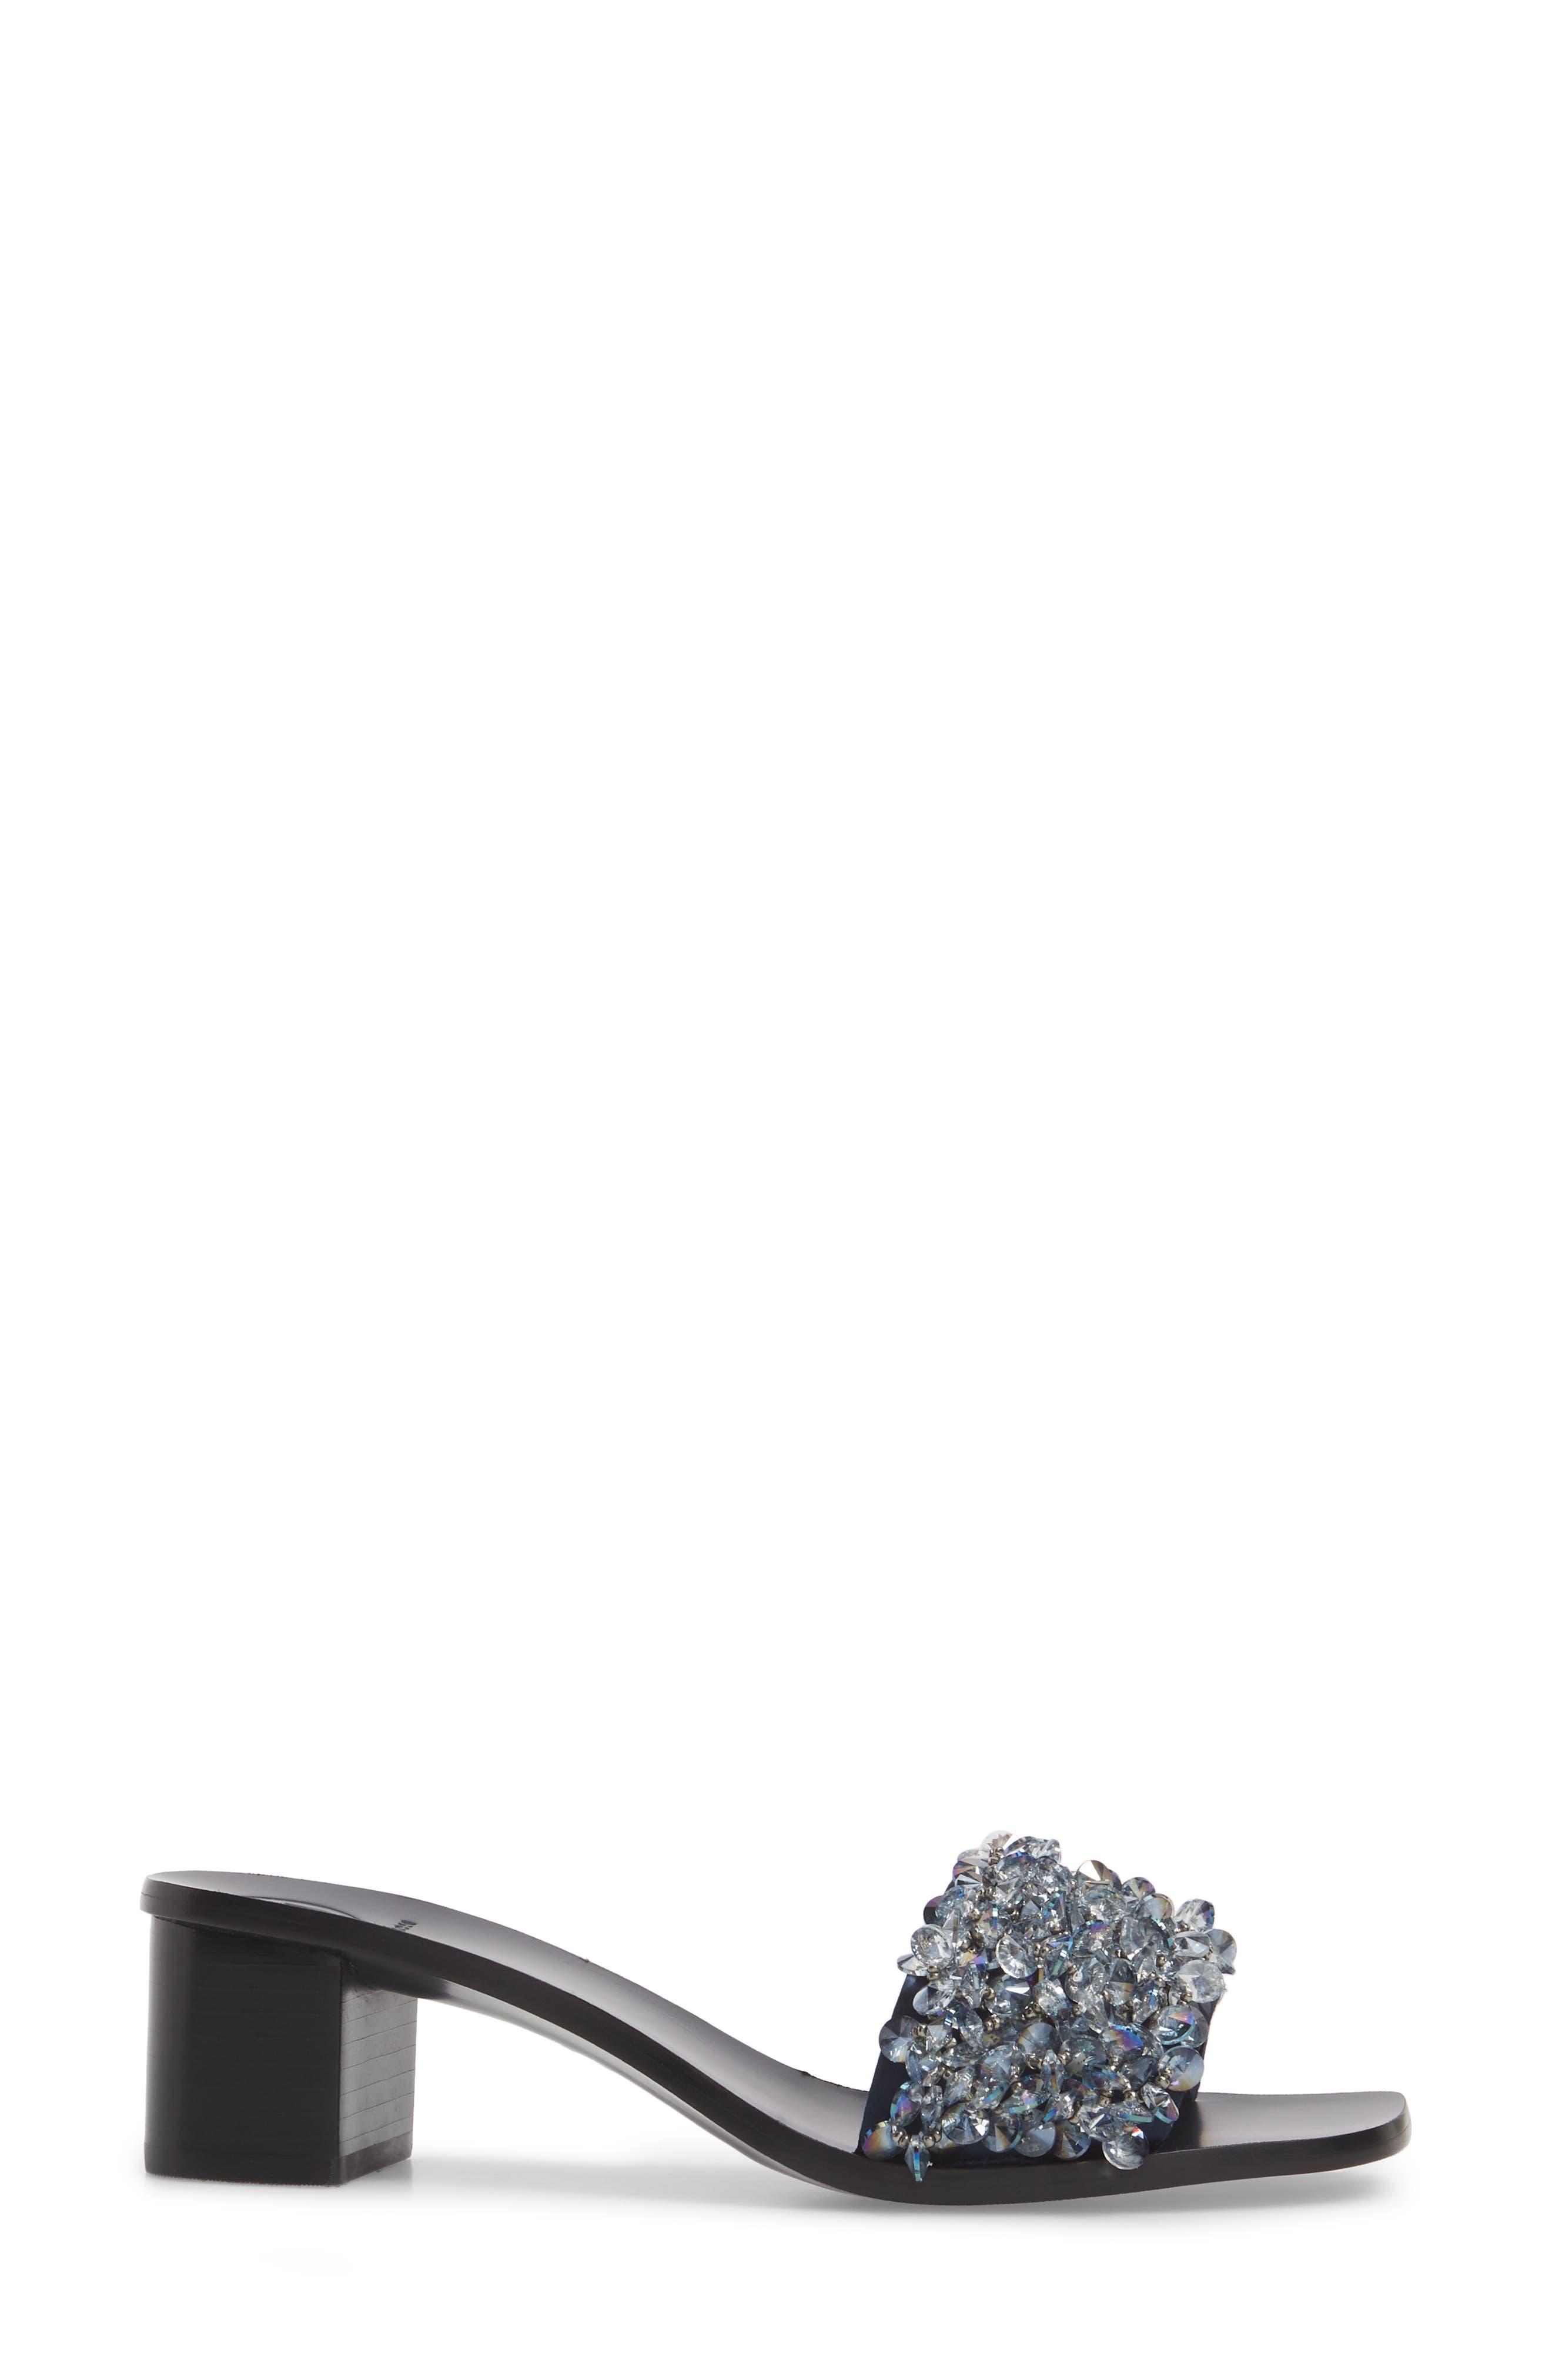 Logan Embellished Slide Sandal,                             Alternate thumbnail 3, color,                             Gray/ Perfect Navy